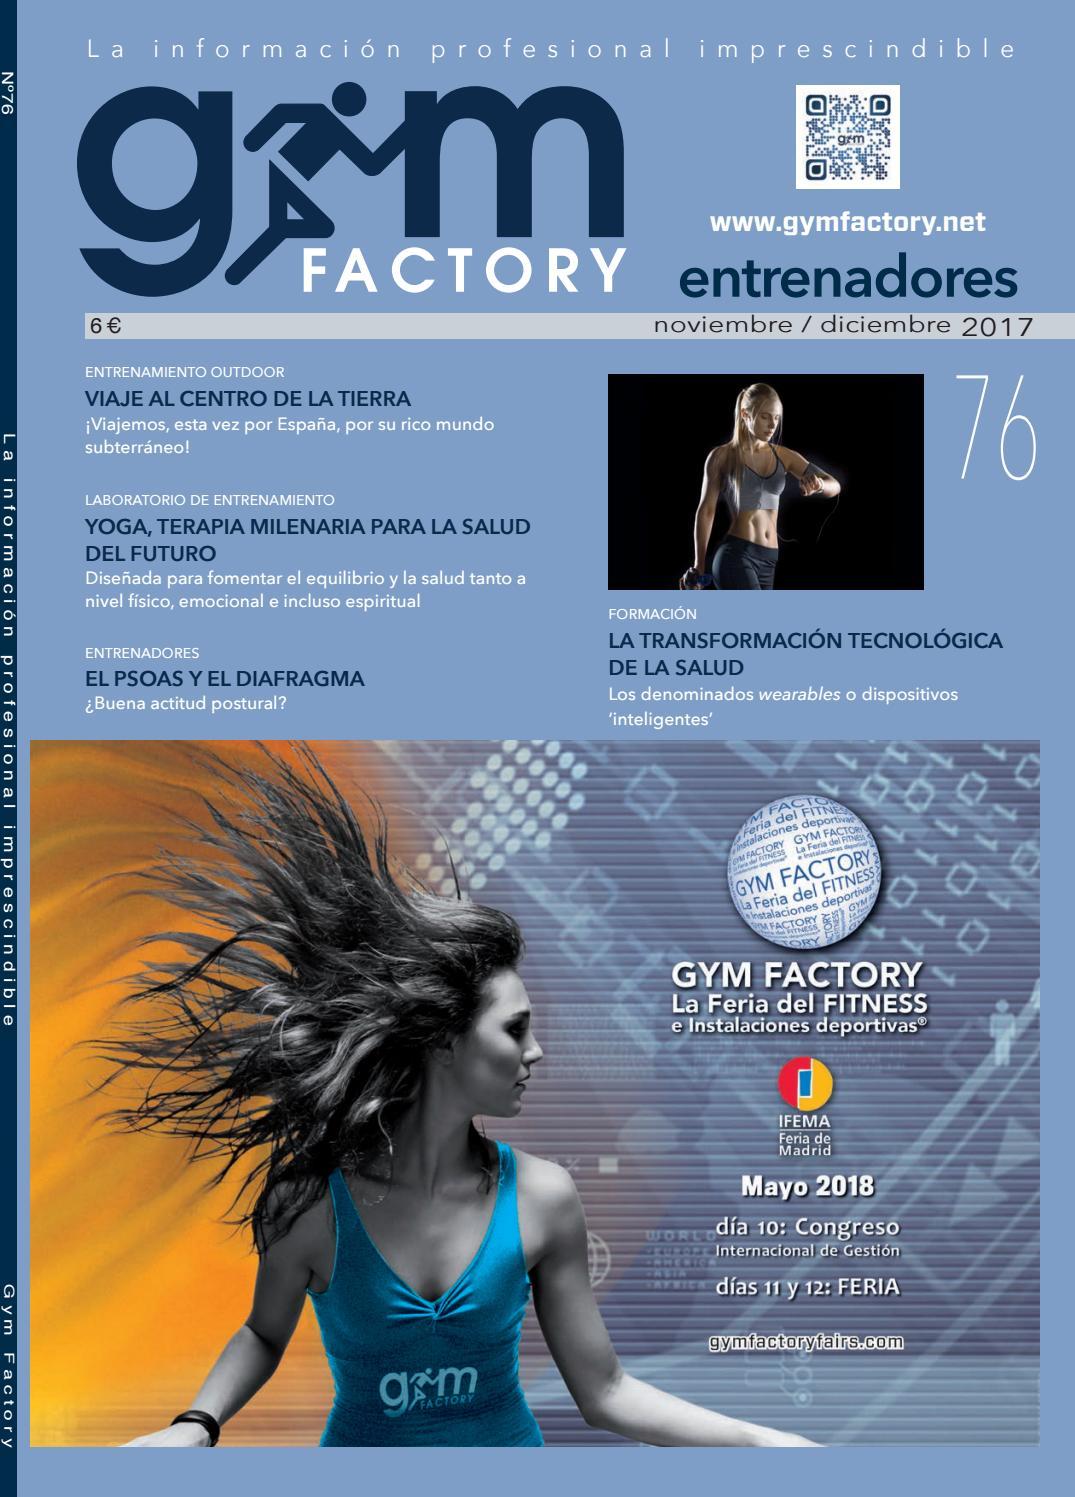 Gym Factory | Entrenadores nº 76 by Gym Factory Magazine - issuu